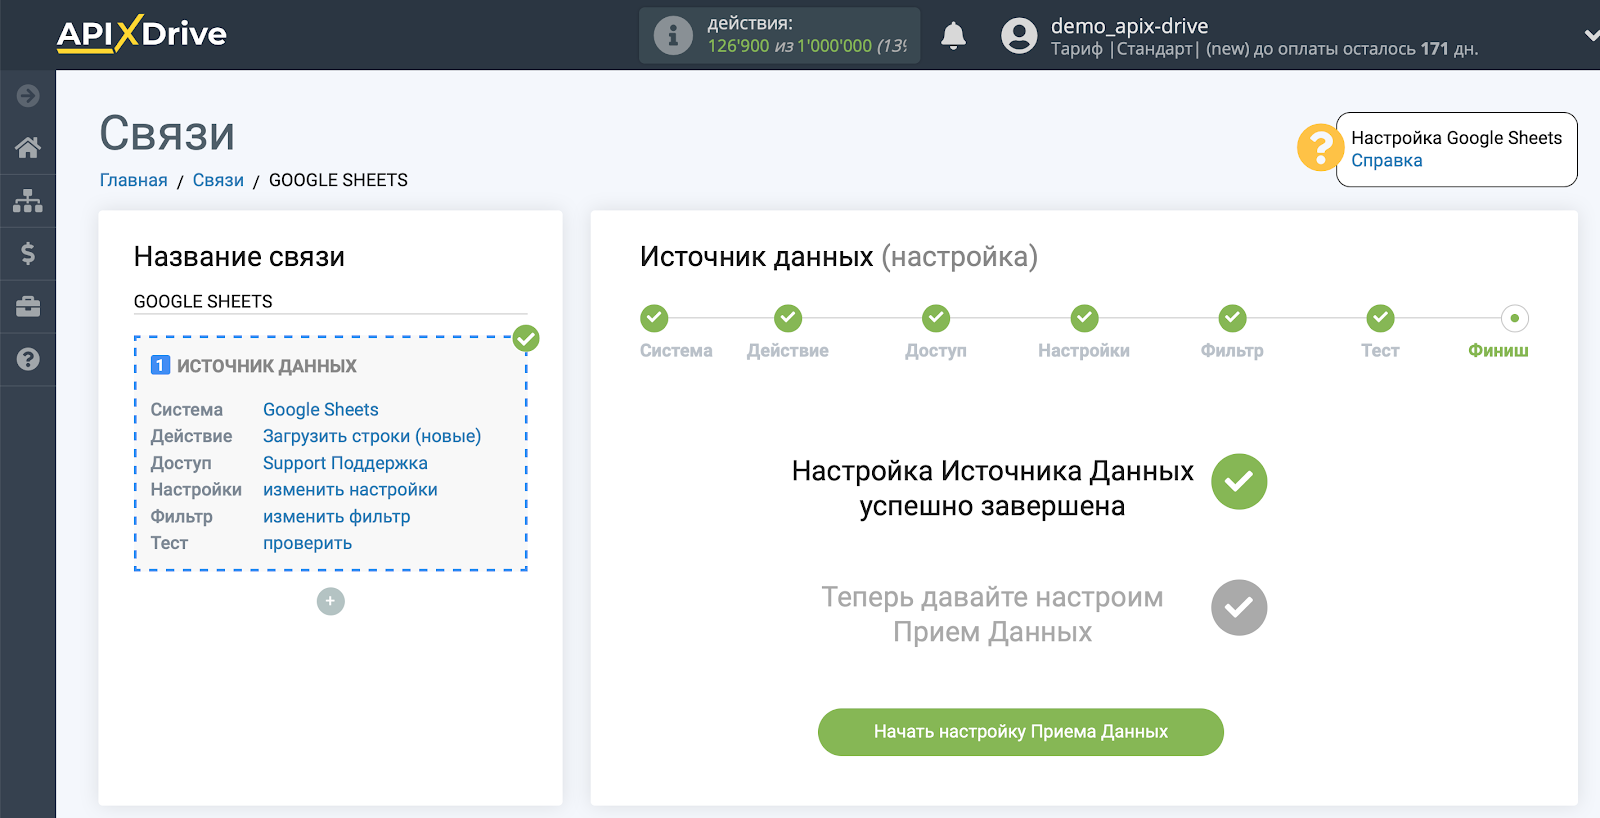 Настройка Приема данных в DashaMail | Начало настройки приема данных